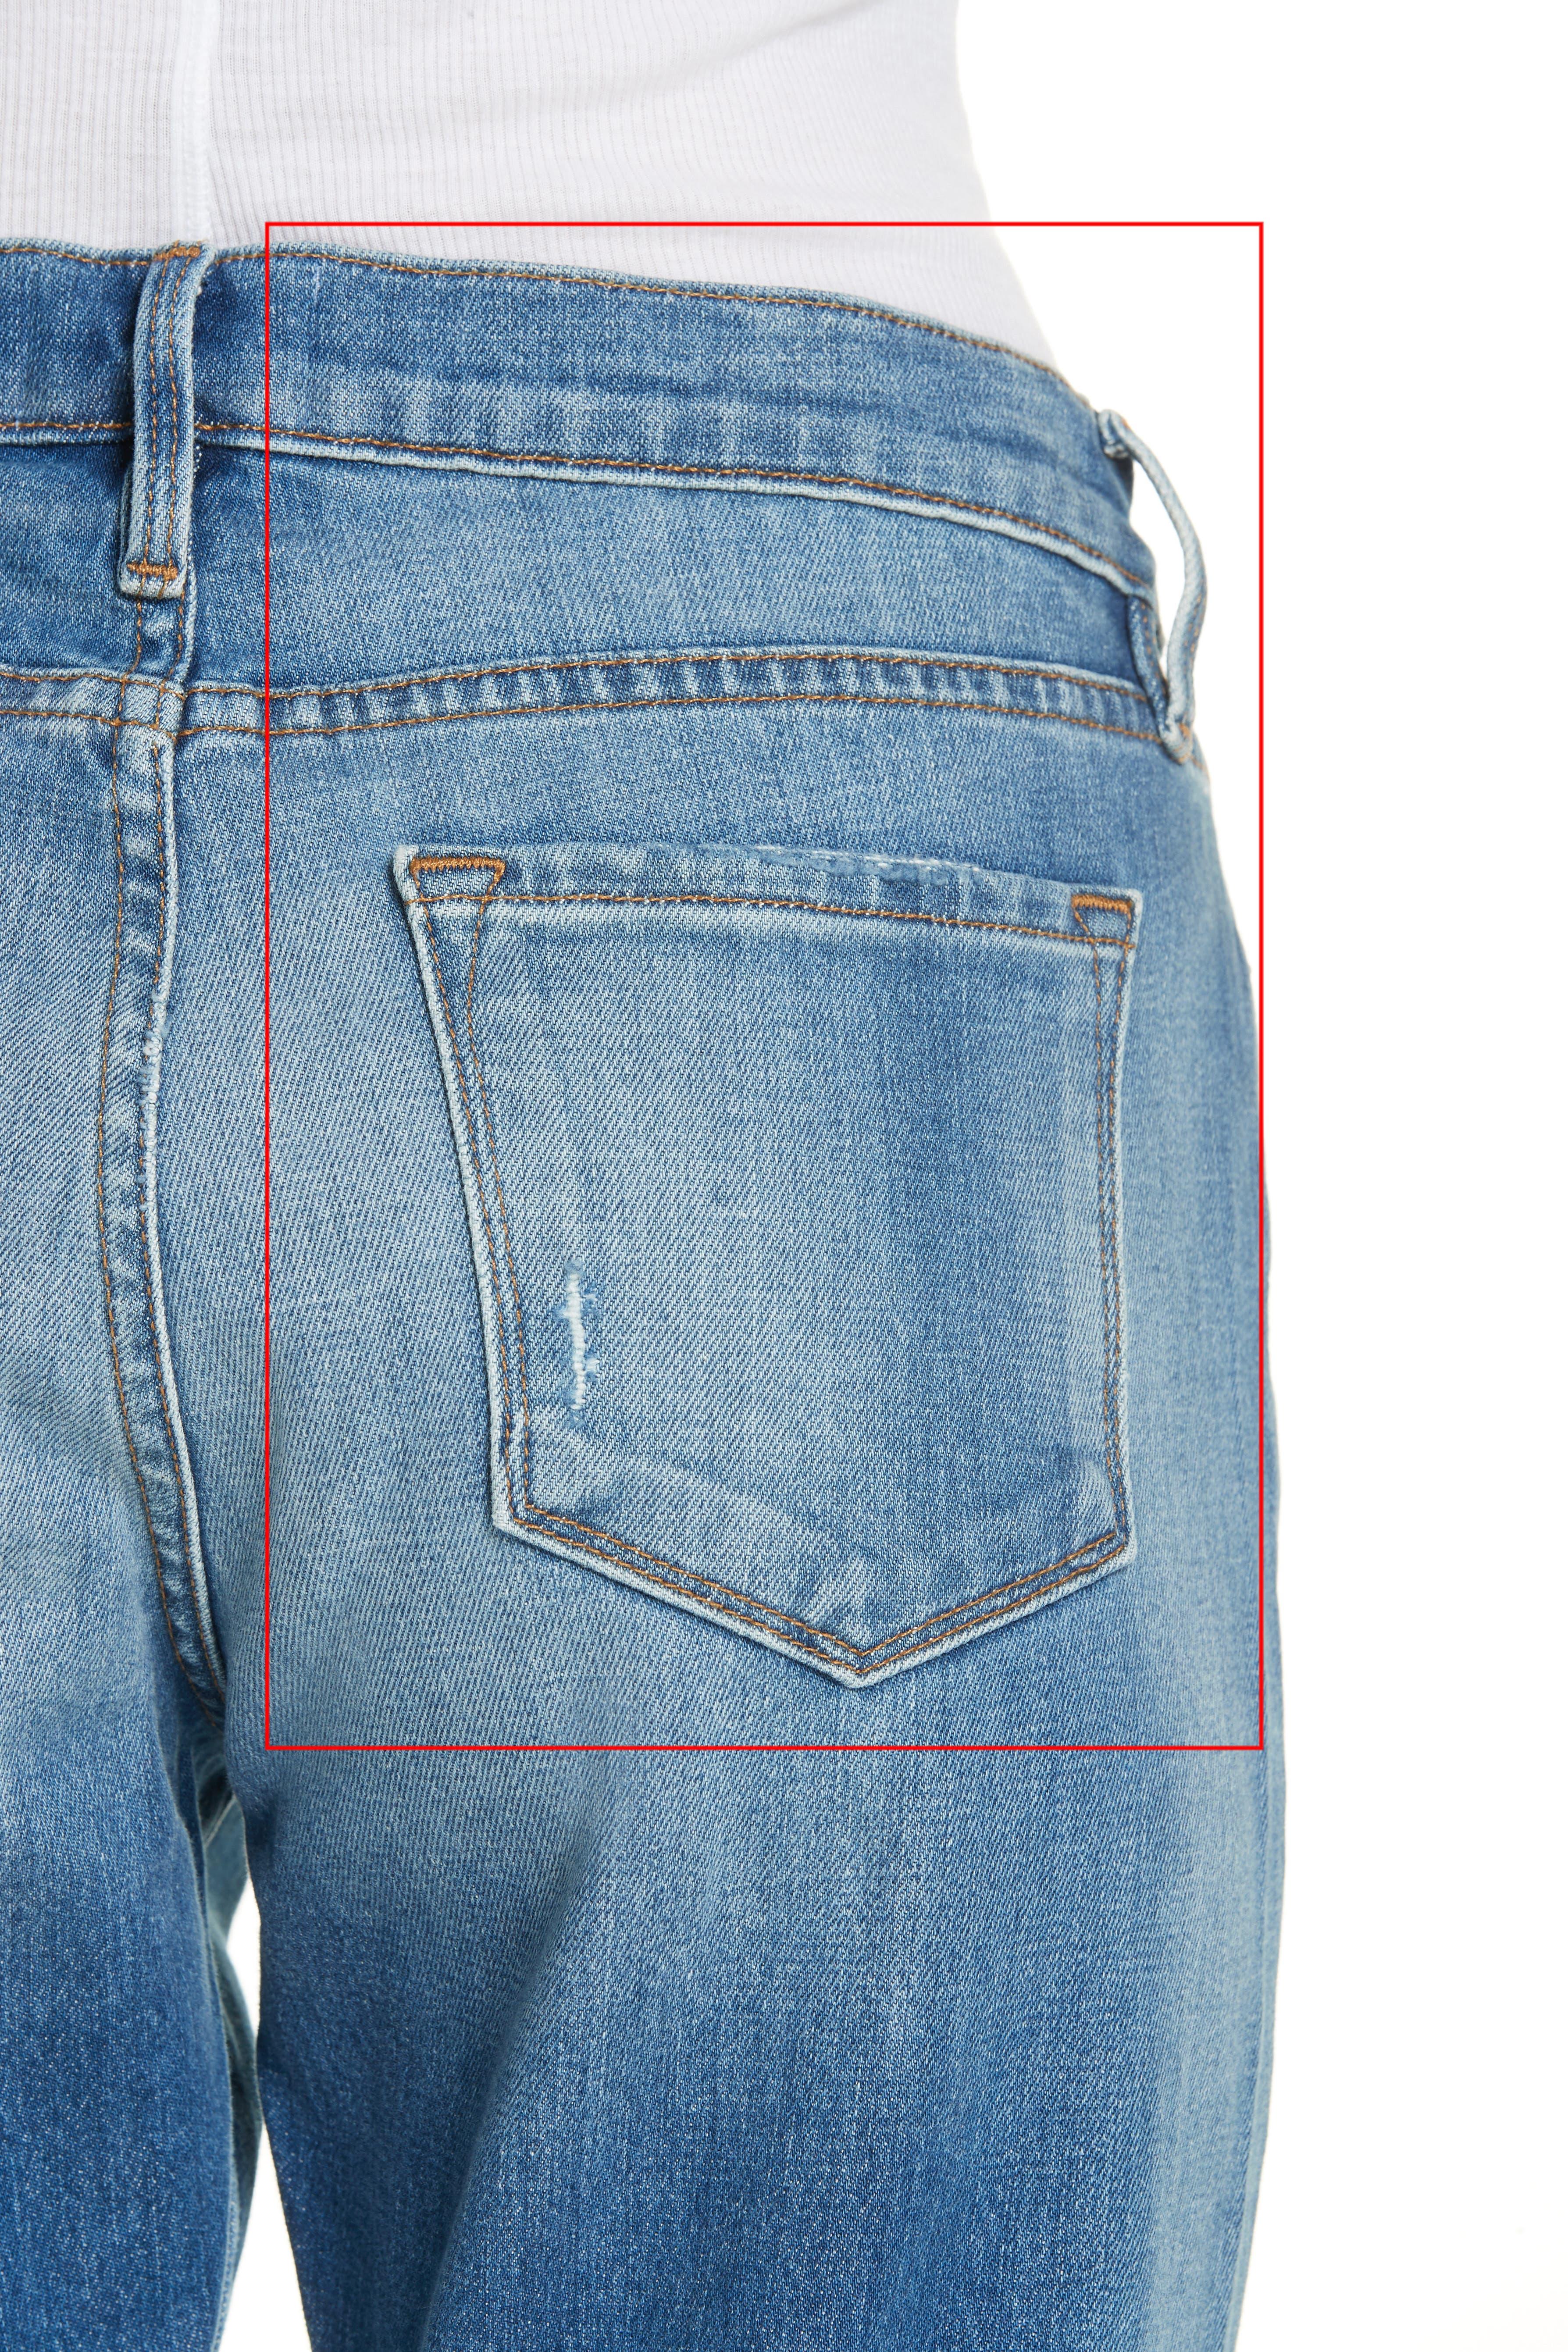 501<sup>™</sup> Slim Fit Jeans,                             Alternate thumbnail 4, color,                             SINGLE PAYER WARP